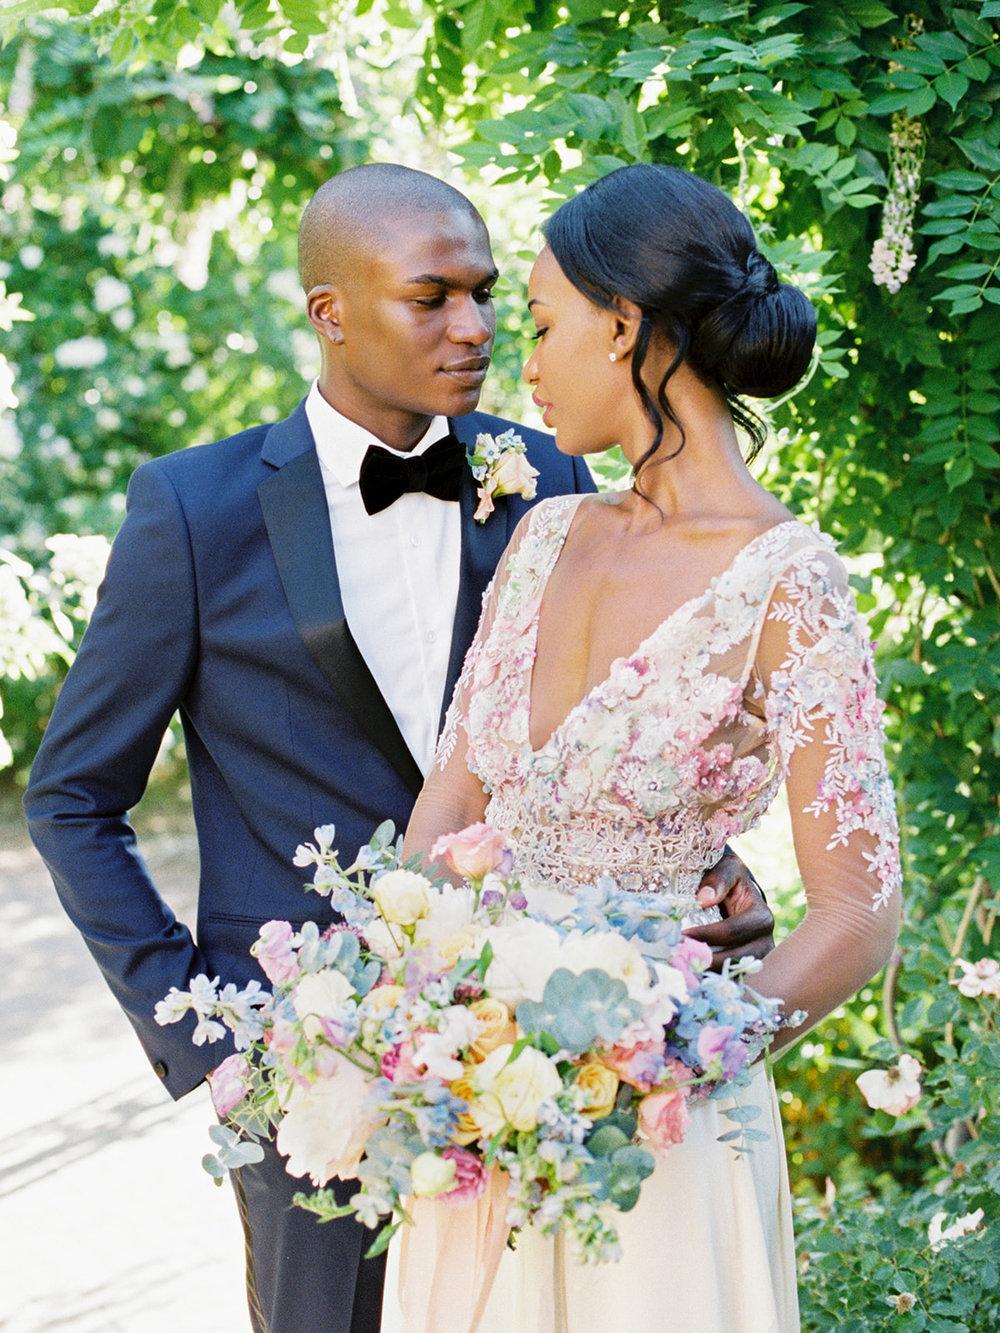 Tara Bielecki Photography - Denver Botanic Garden Wedding featured on Style Me Pretty